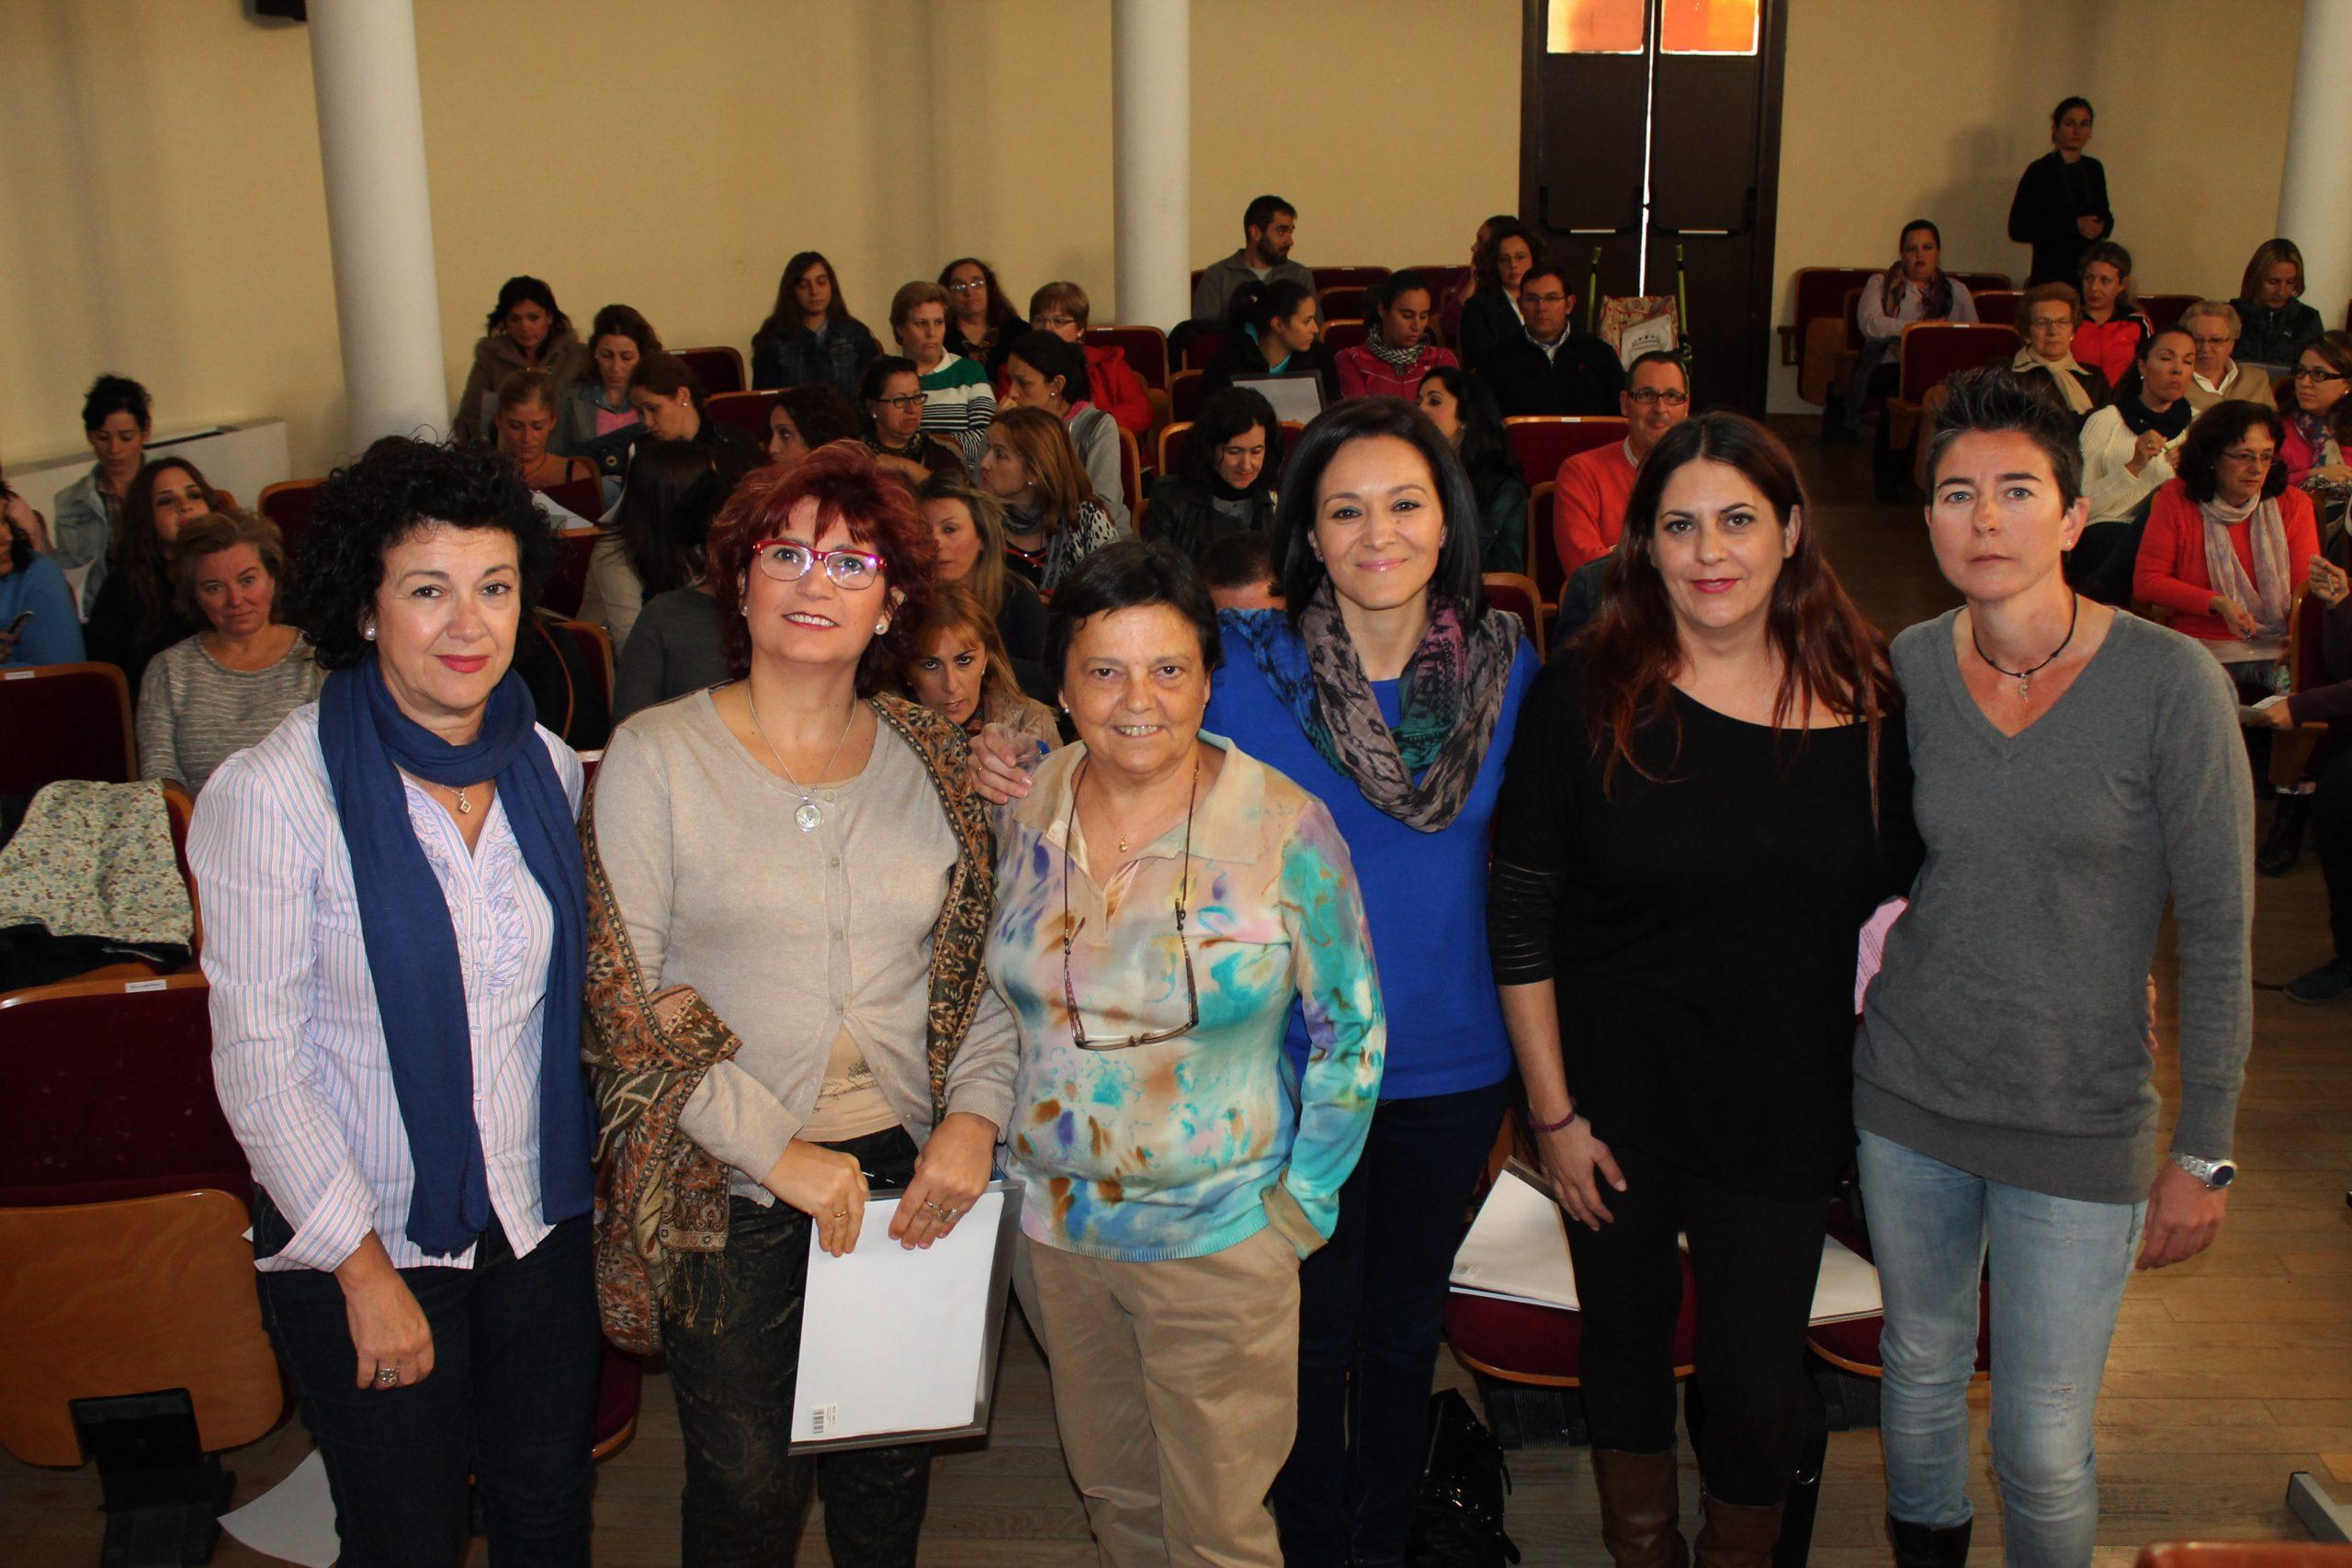 La Carlota celebra sus séptimas jornadas 'Jóvenes y Familias' 1